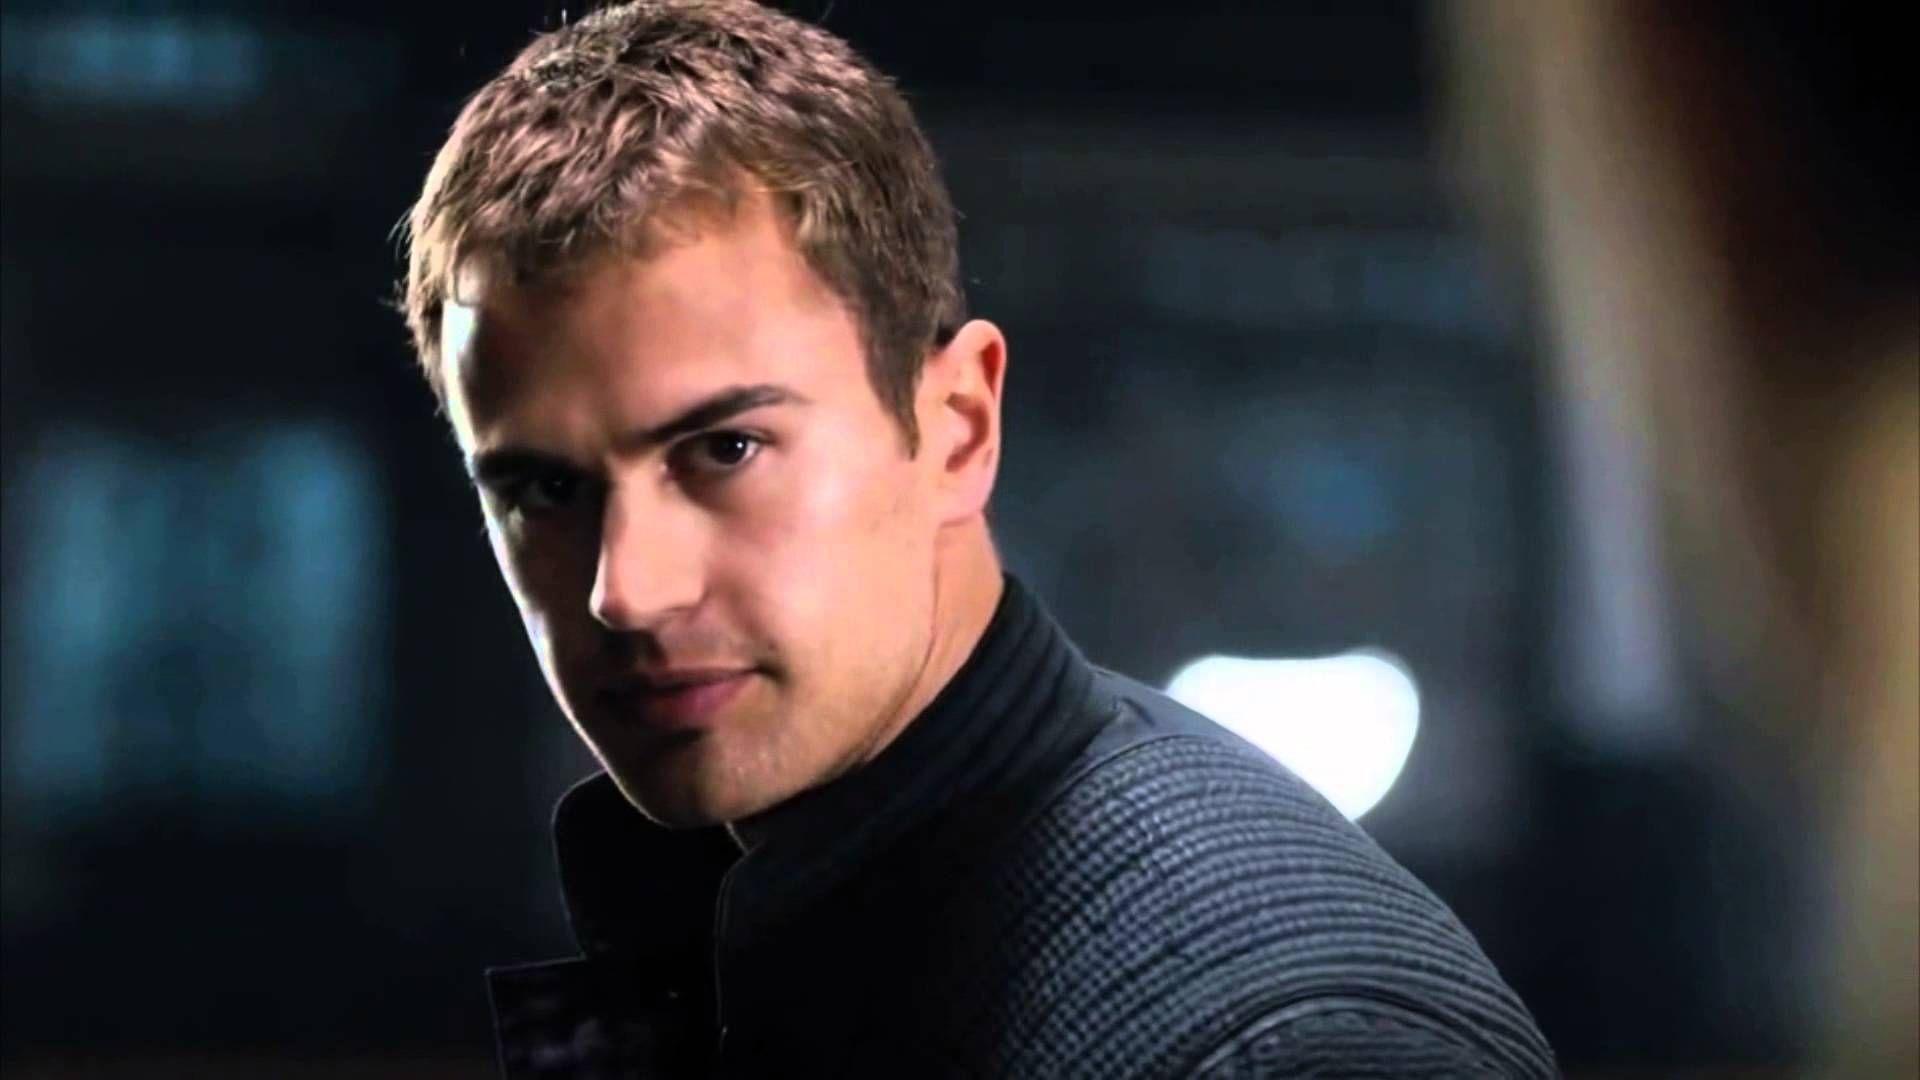 Tris & Four [Divergent] - Who am I living for? | Divergent ...